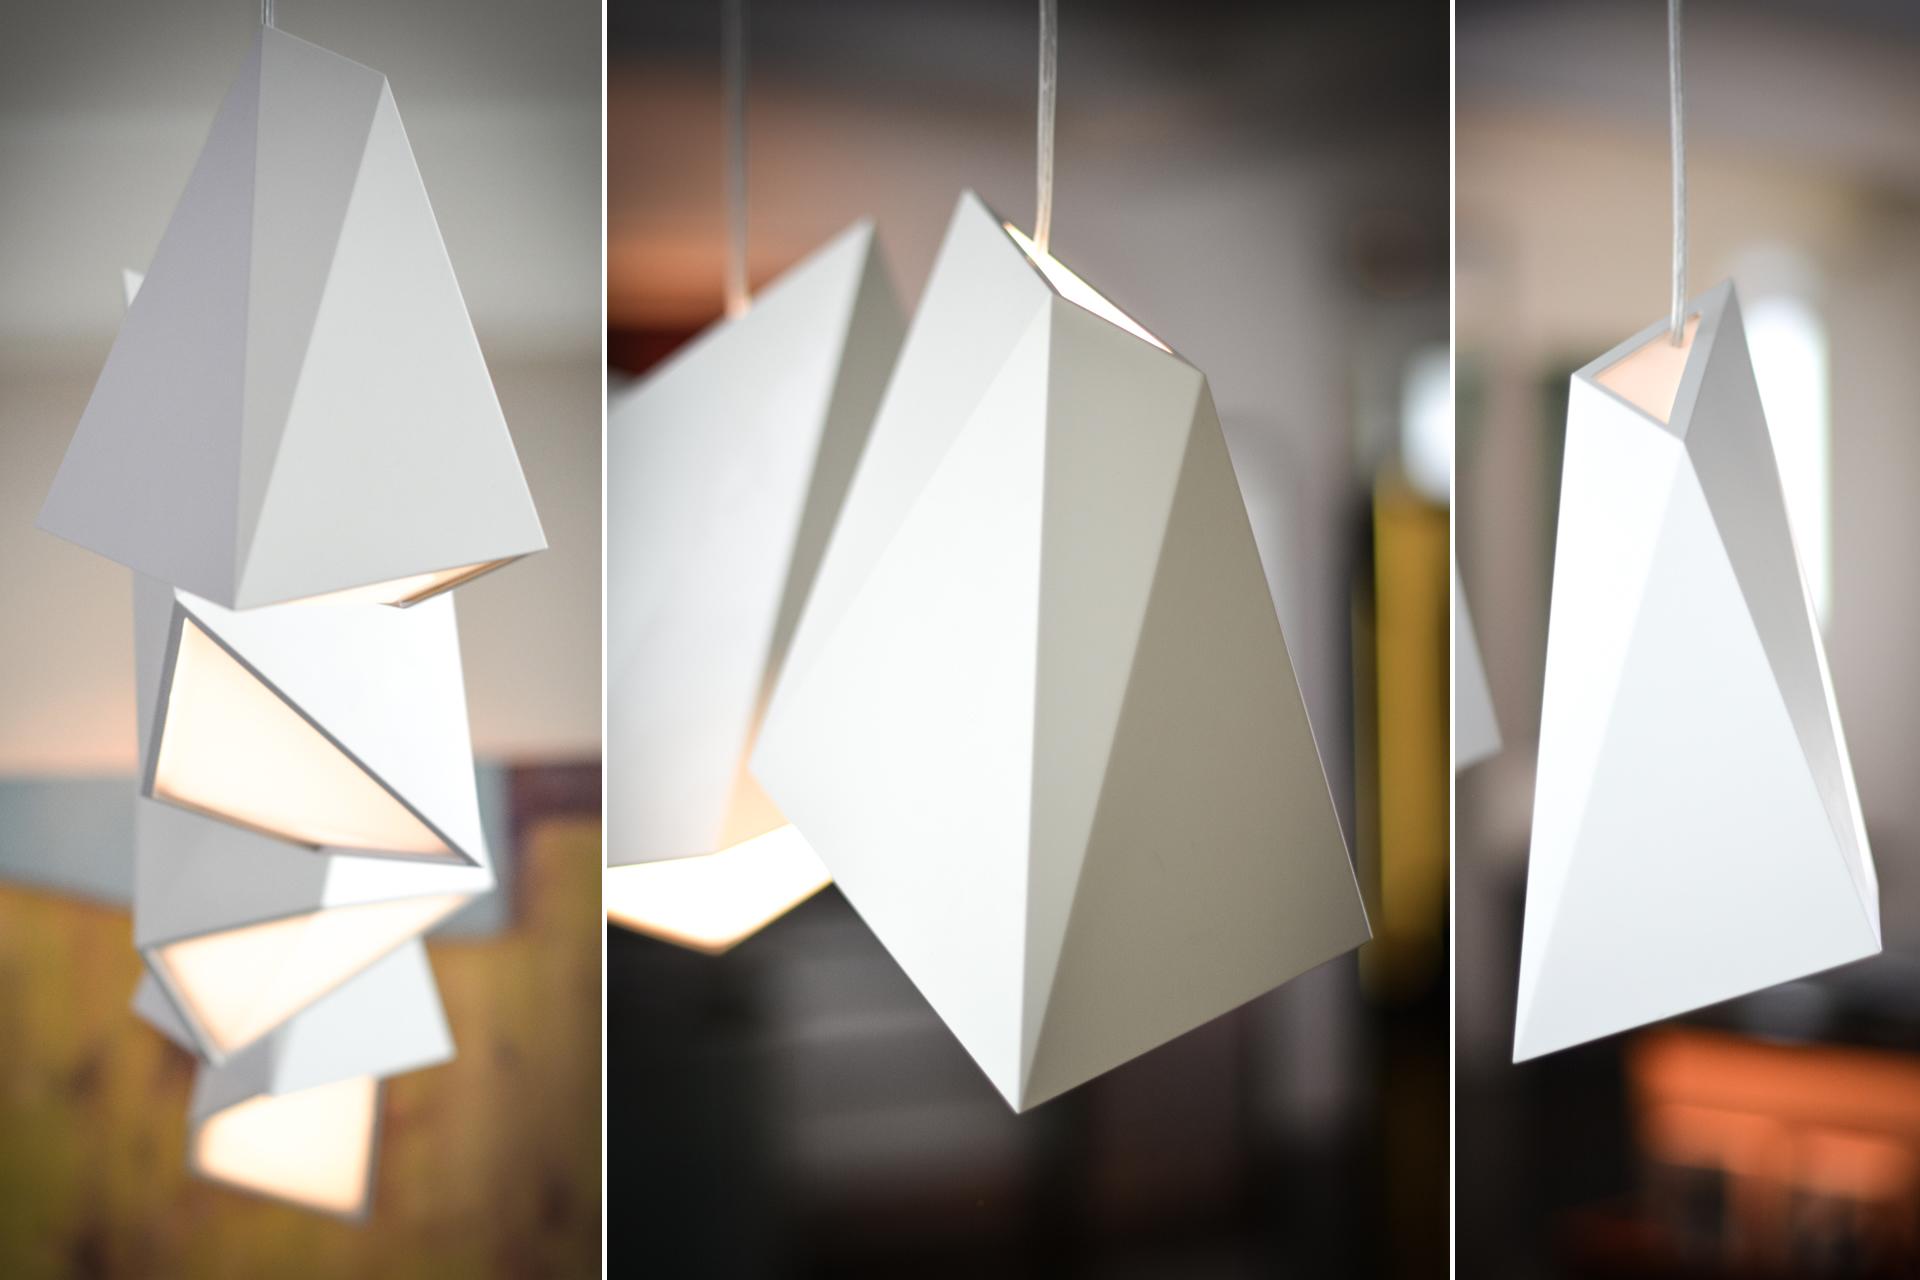 ice_lamp_02.jpg